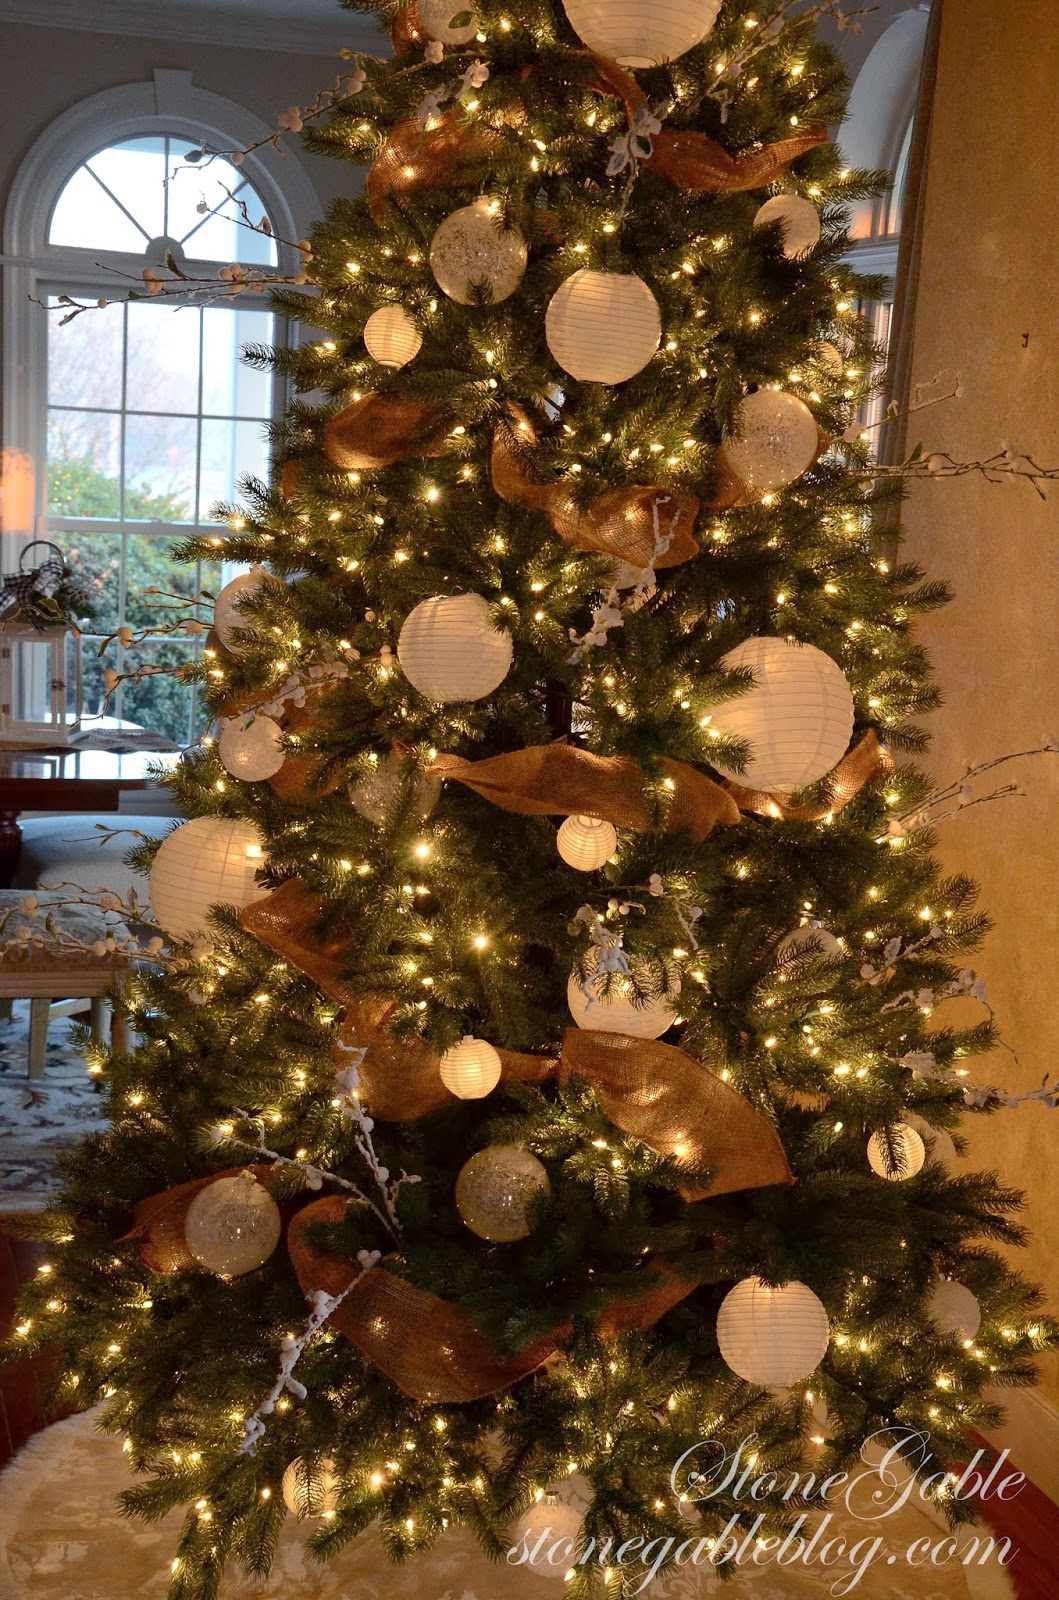 Christmas Tree Closeup Stonegableblog